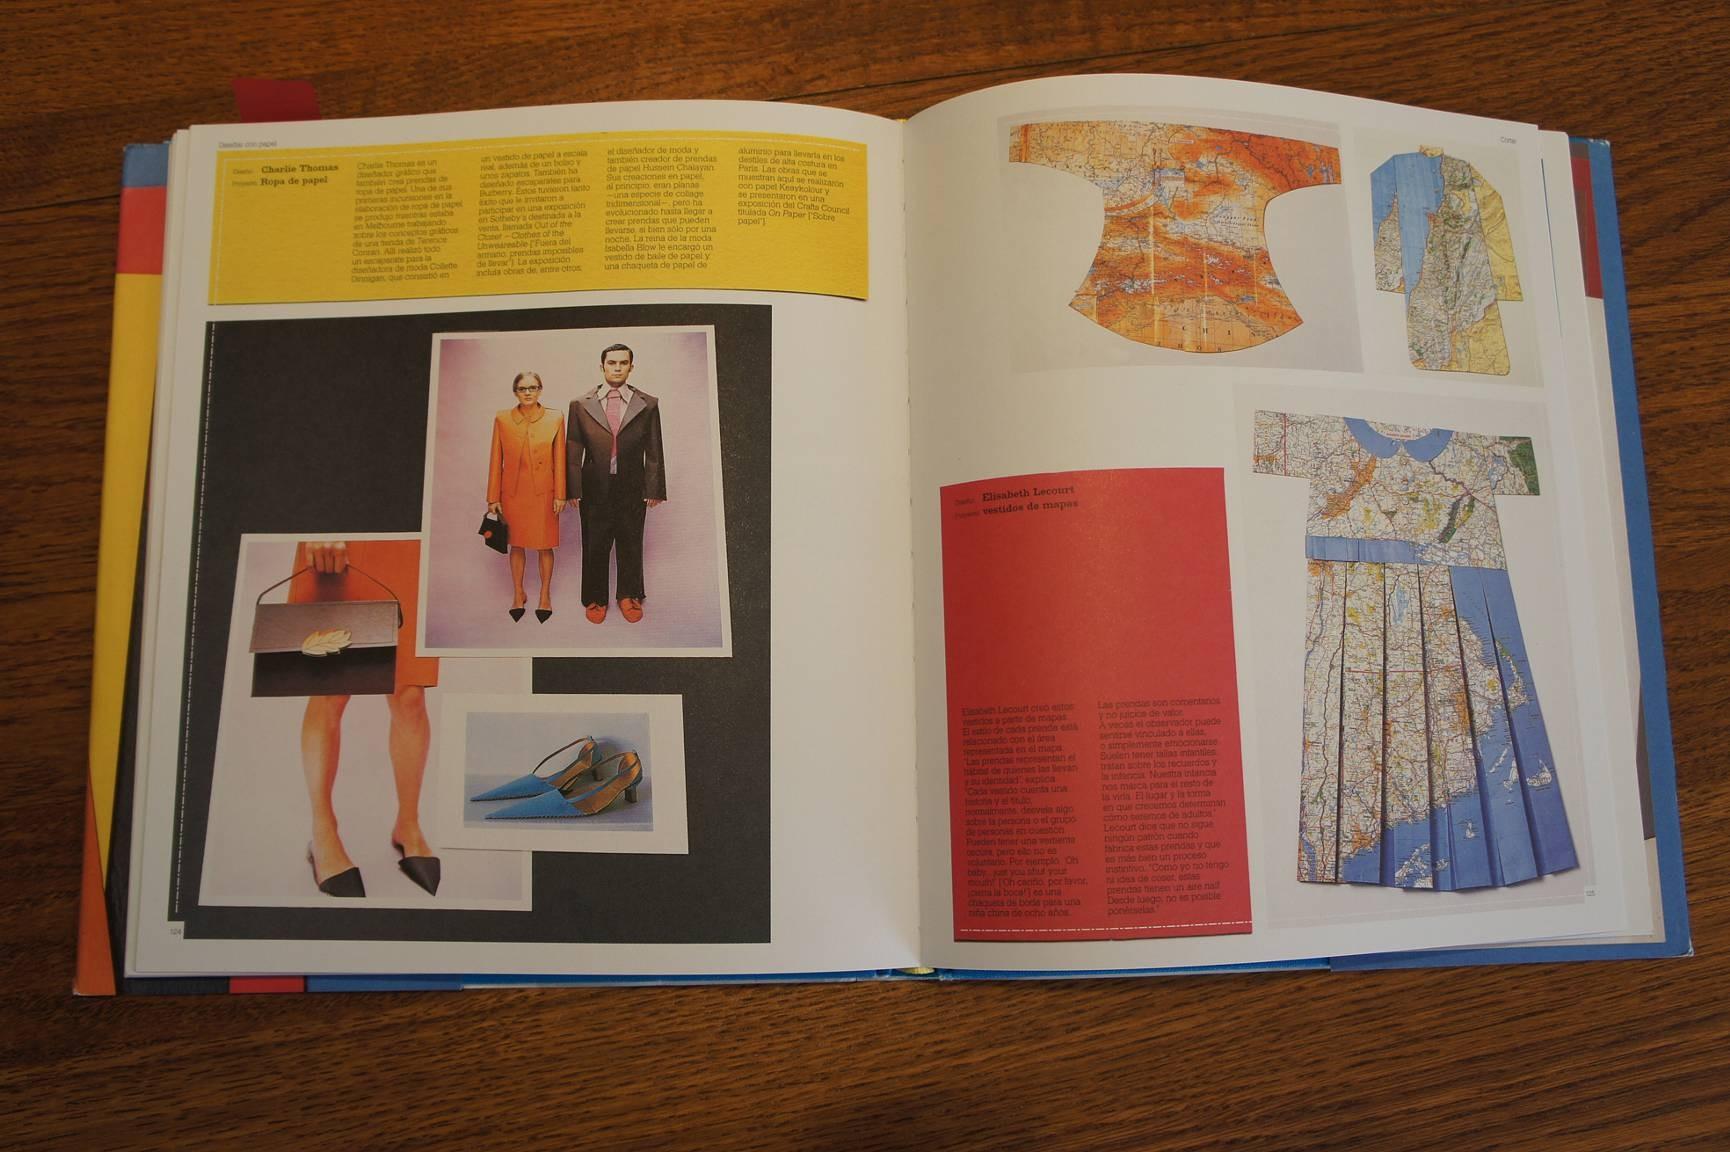 Papercraft Materials Das Analoge Nähert Sich Dem Grafischen Design An · Lomography